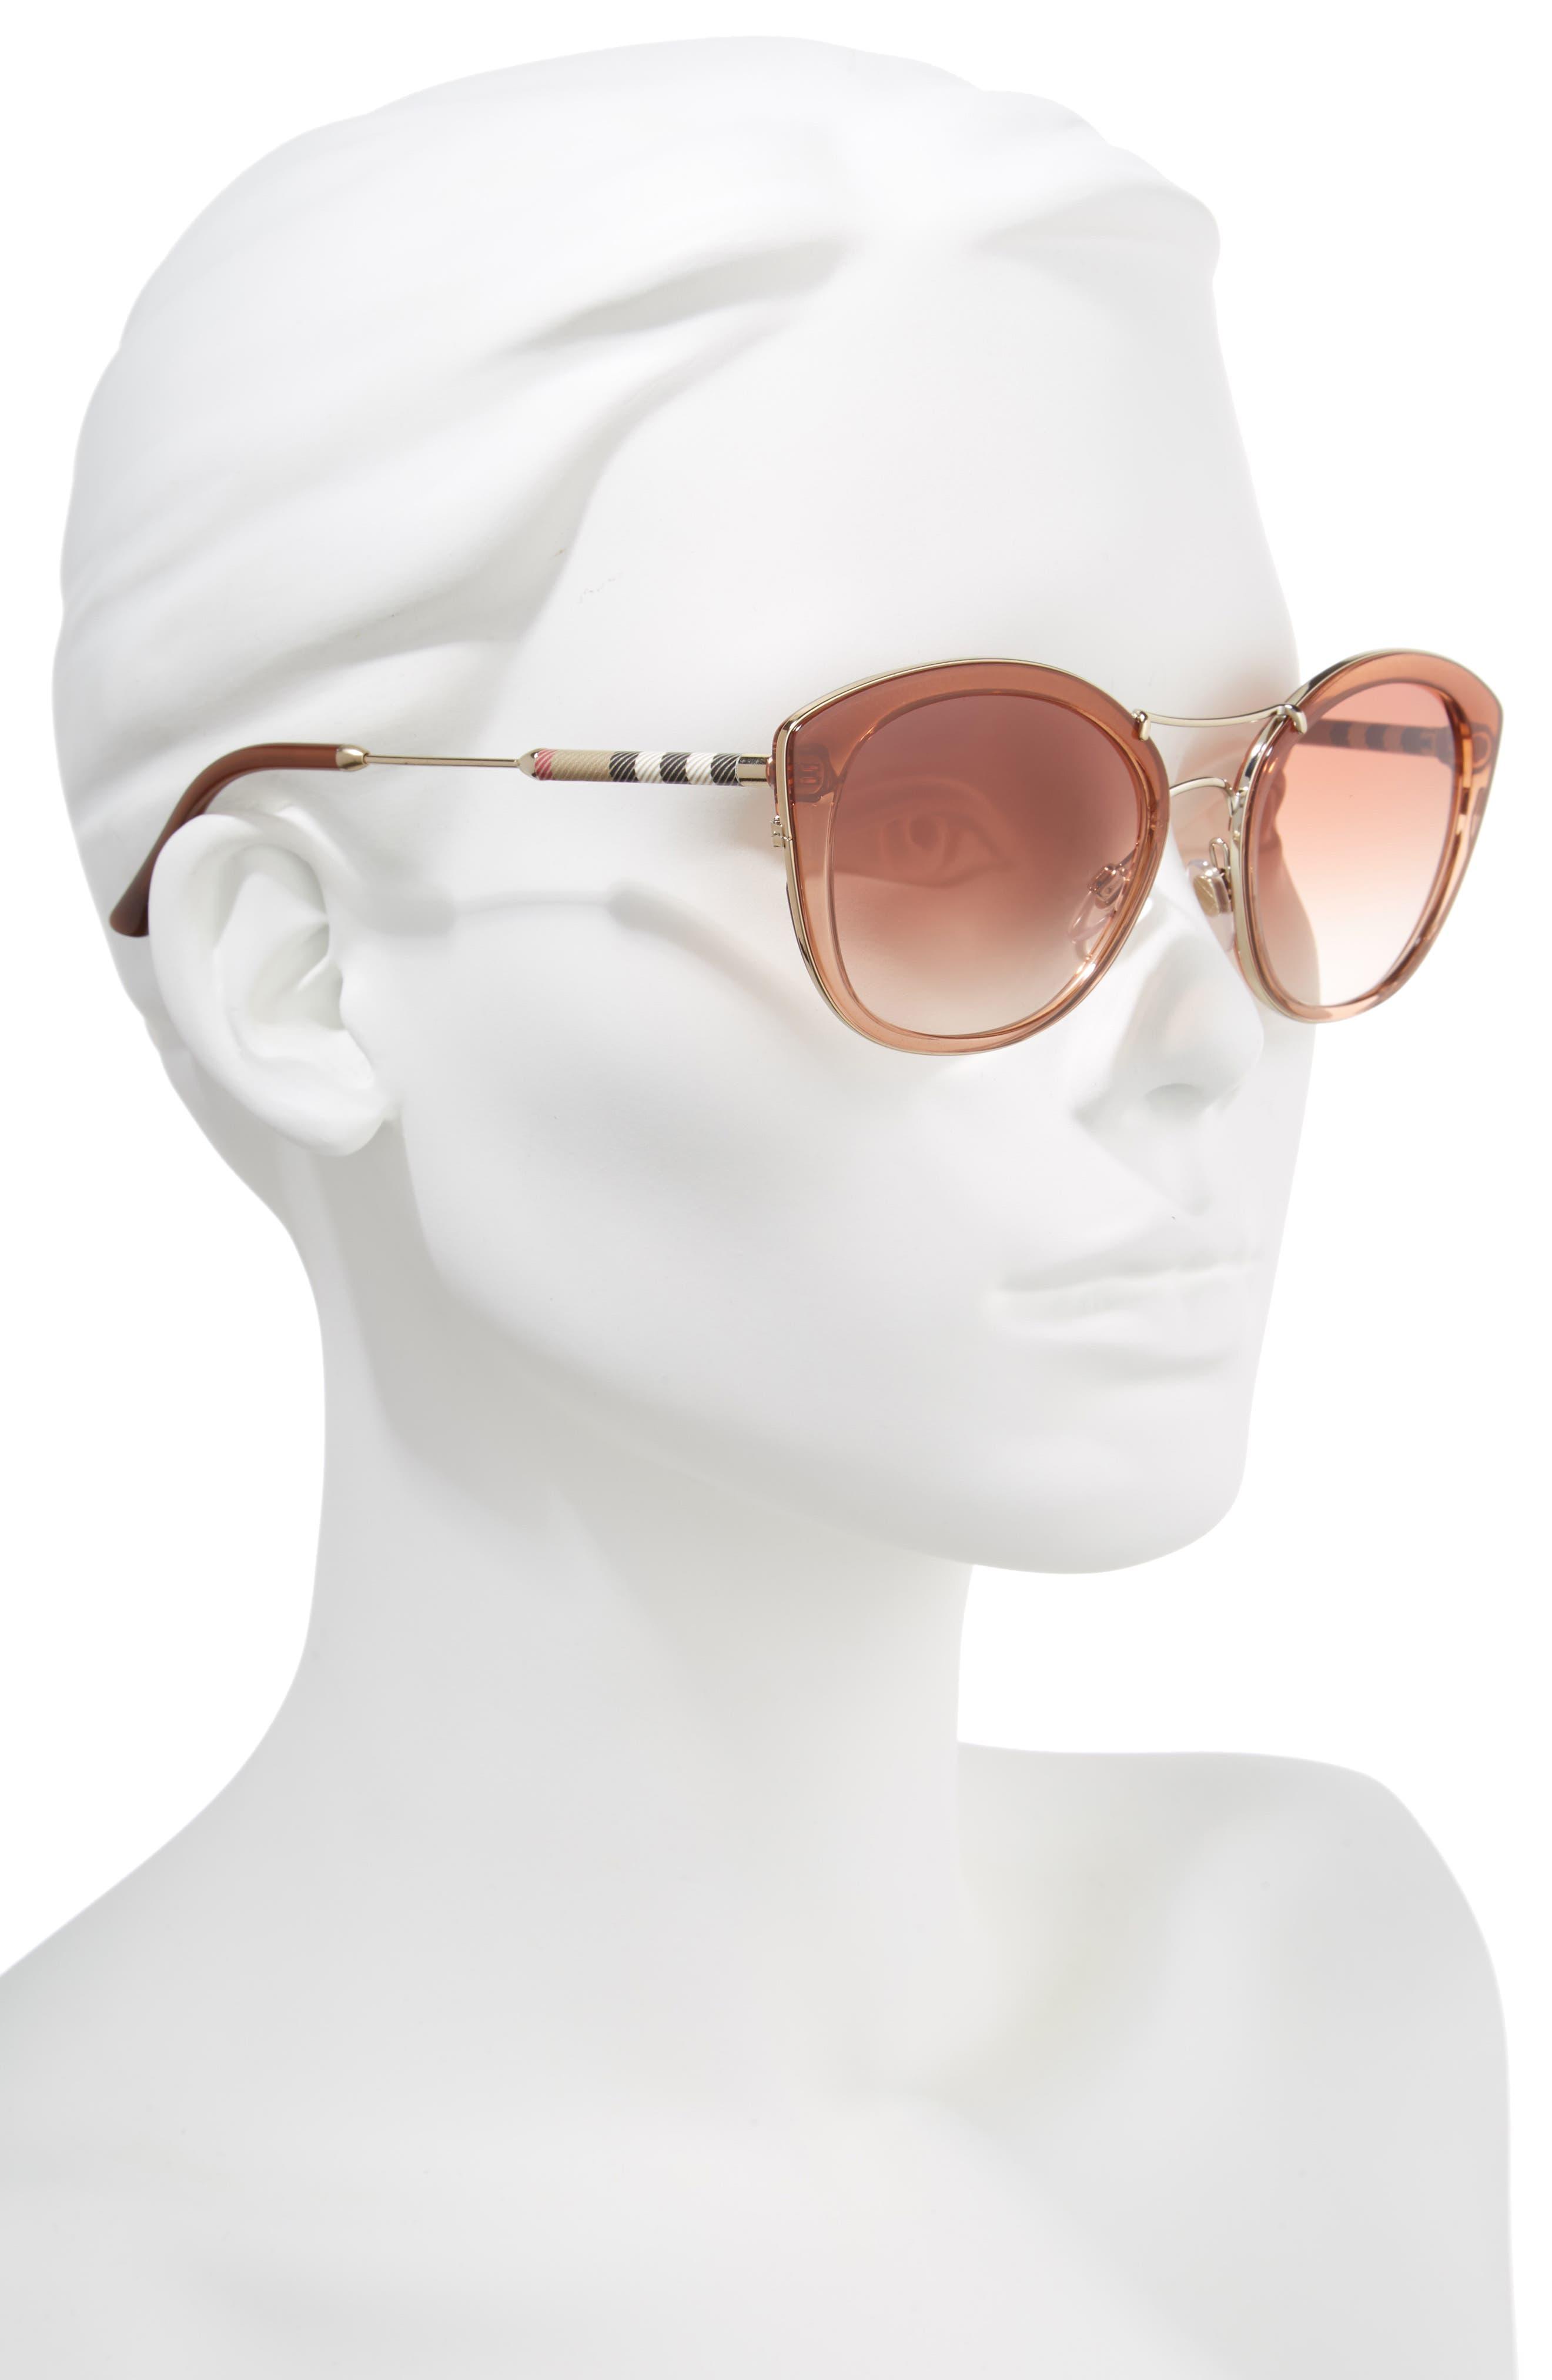 53mm Gradient Sunglasses,                             Alternate thumbnail 2, color,                             BROWN GRADIENT